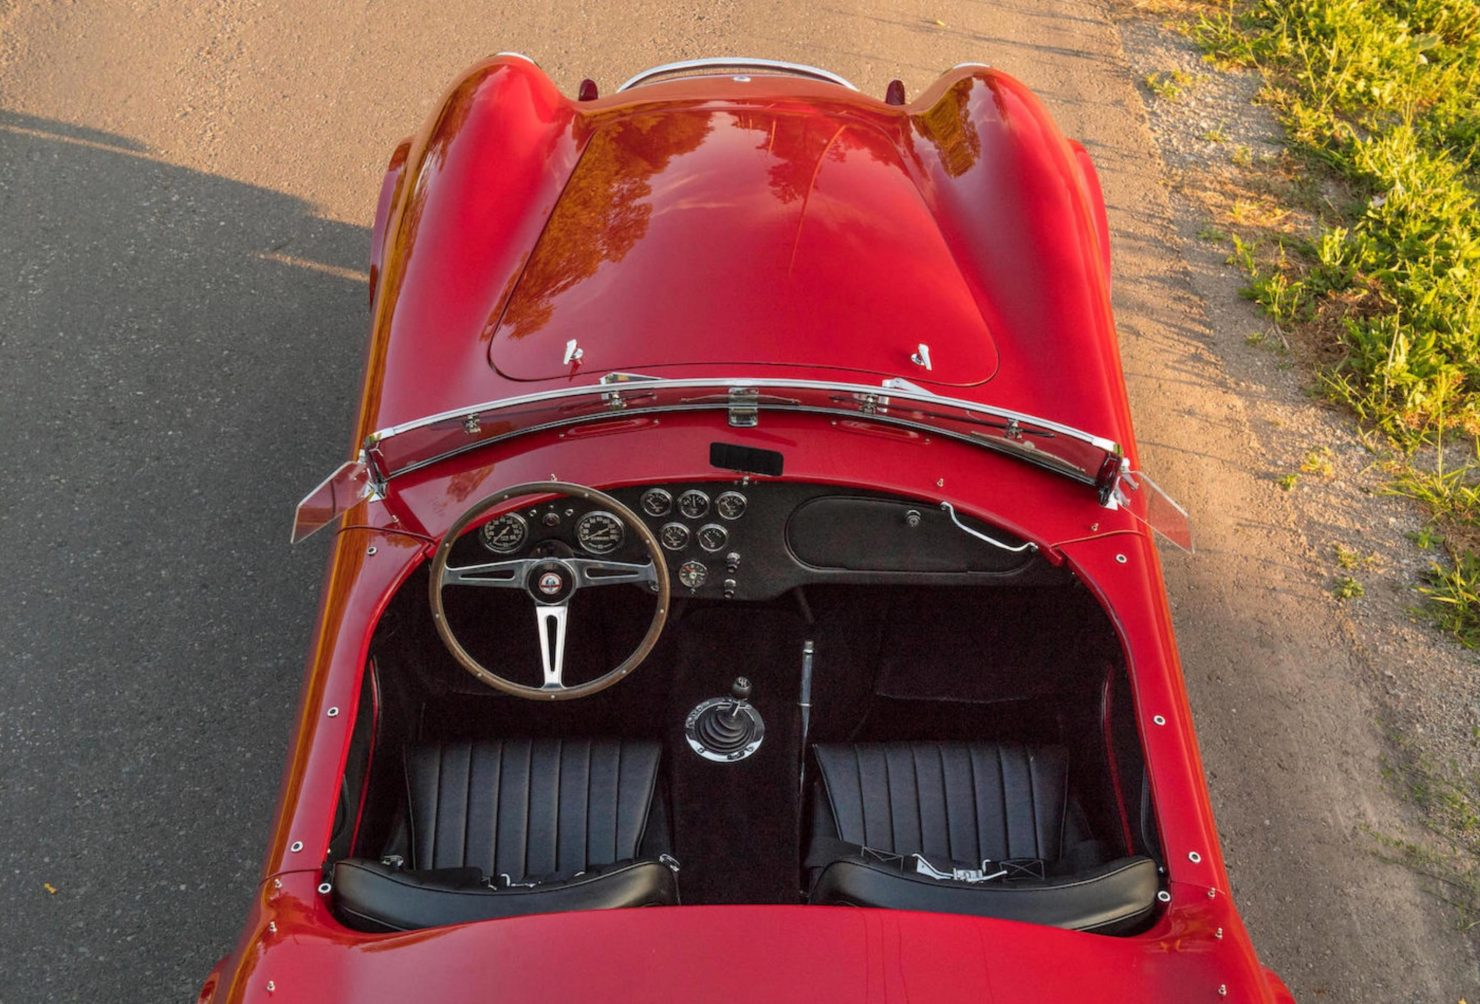 shelby ac cobra 289 21 1480x1004 - 1964 Shelby AC Cobra 289